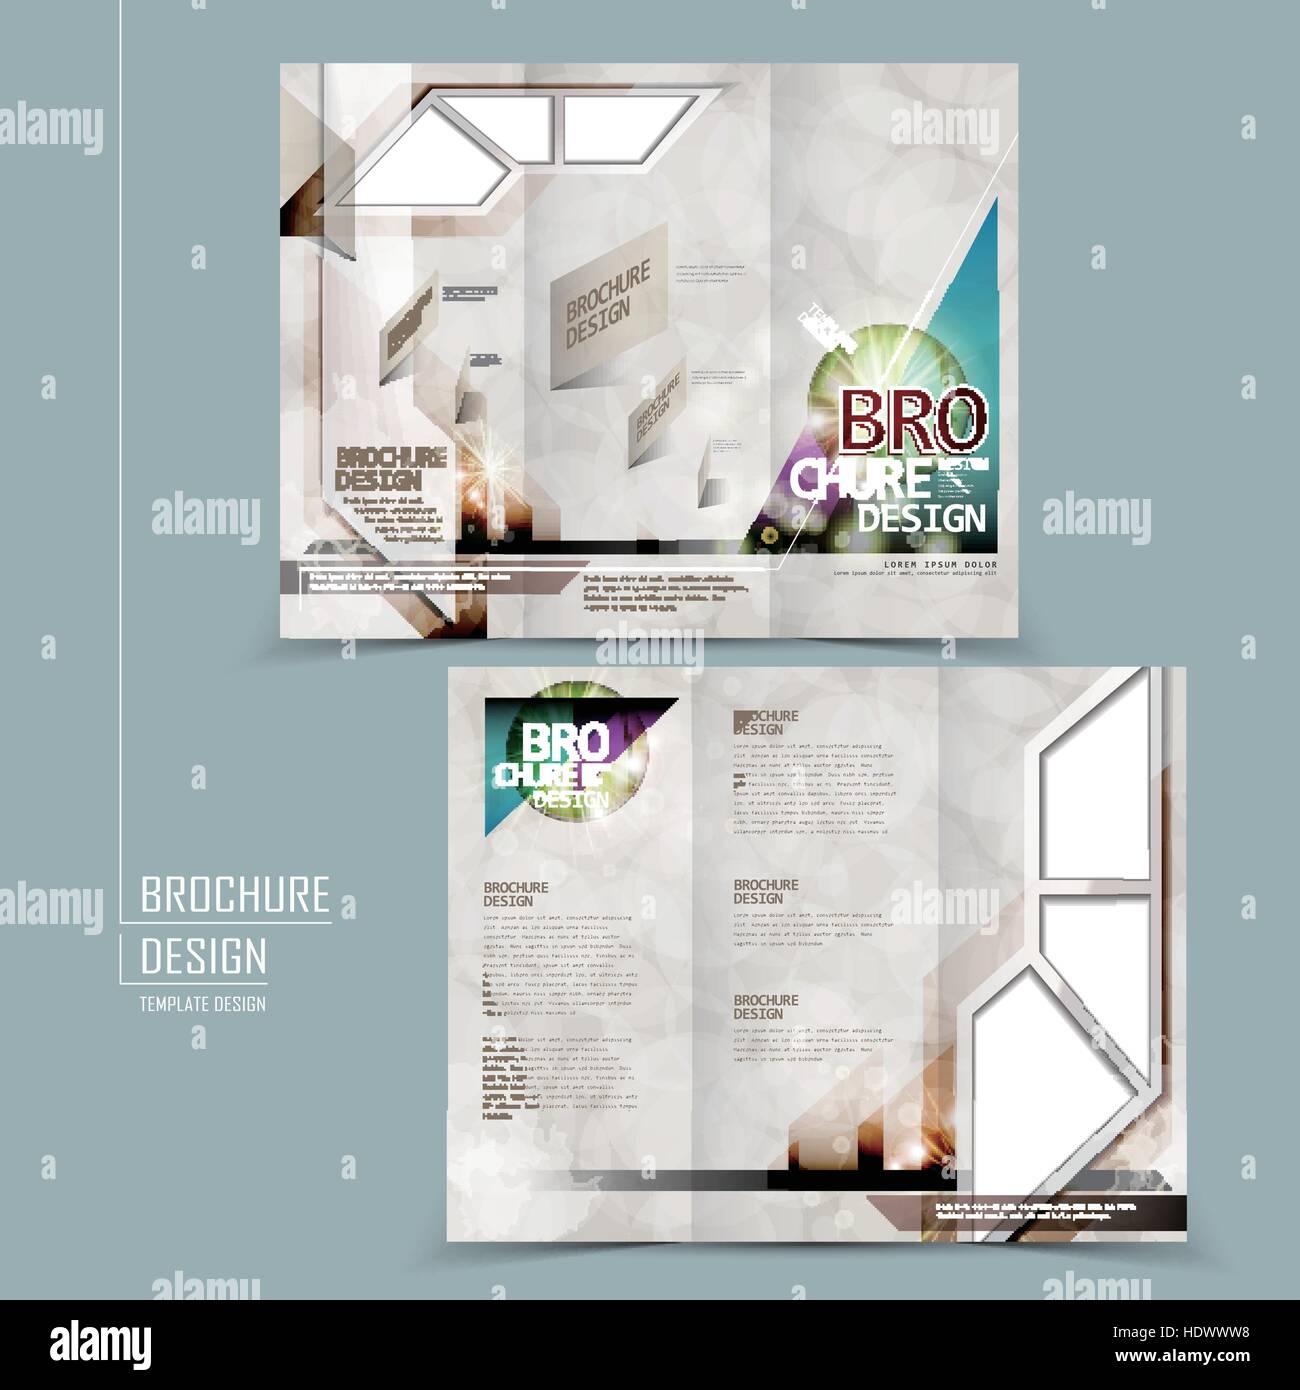 modern tri fold template brochure design in technology style stock